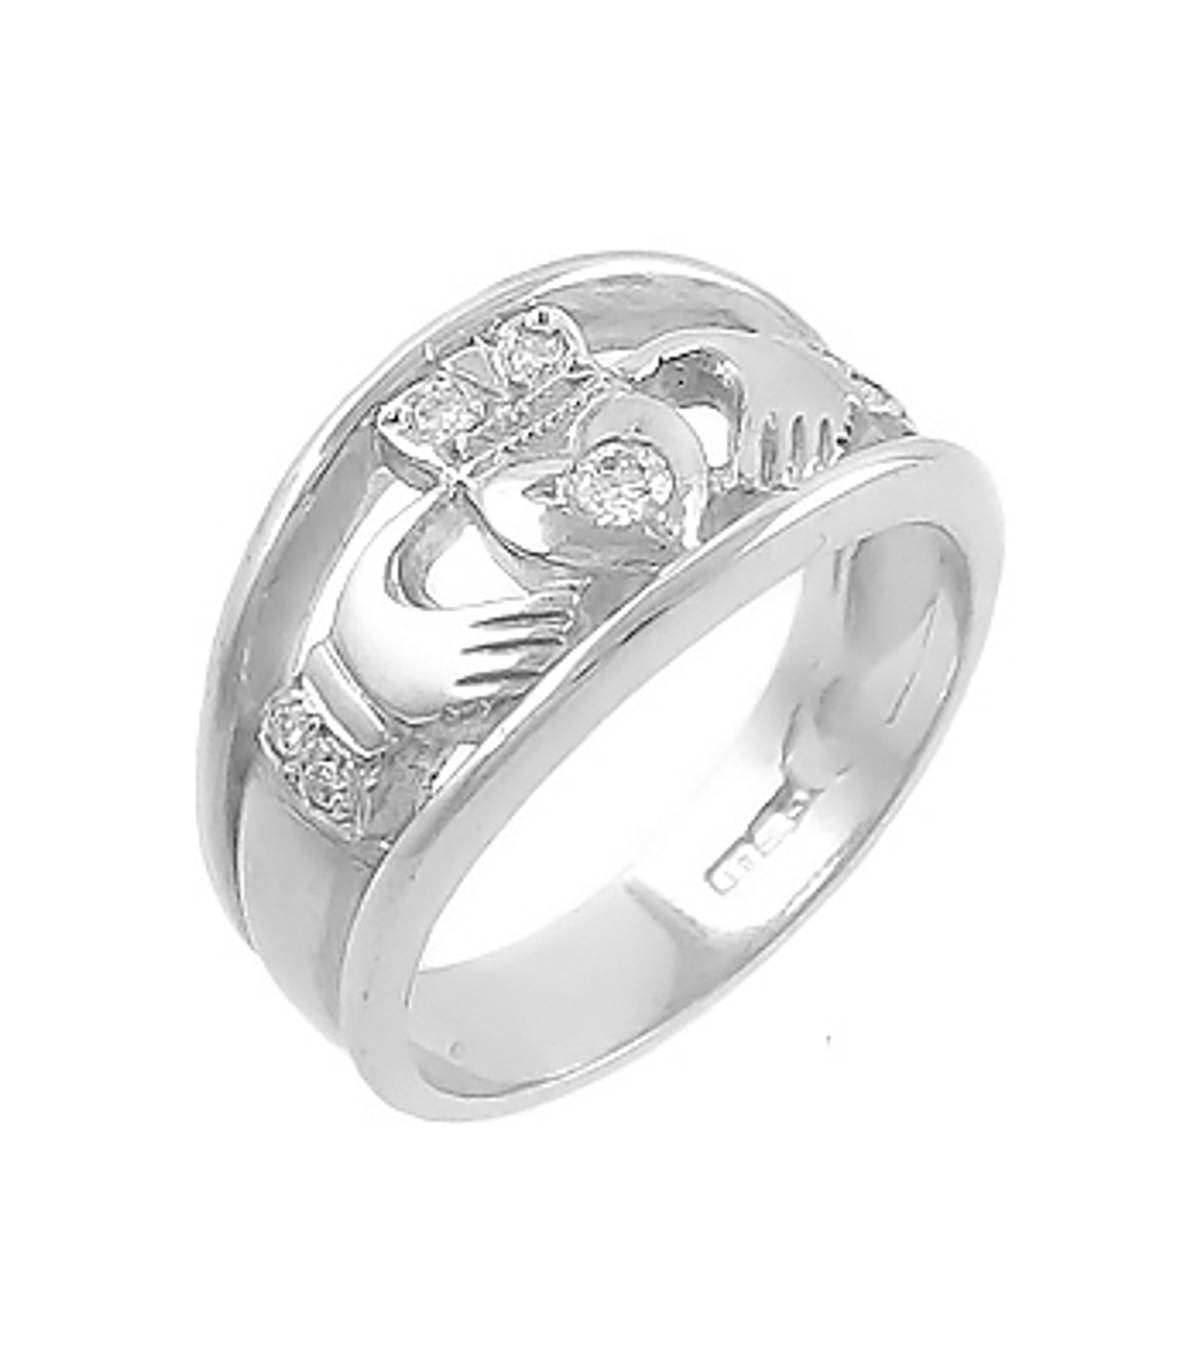 Irish made14 carat white gold 0.11cts diamonds claddagh engagement ring